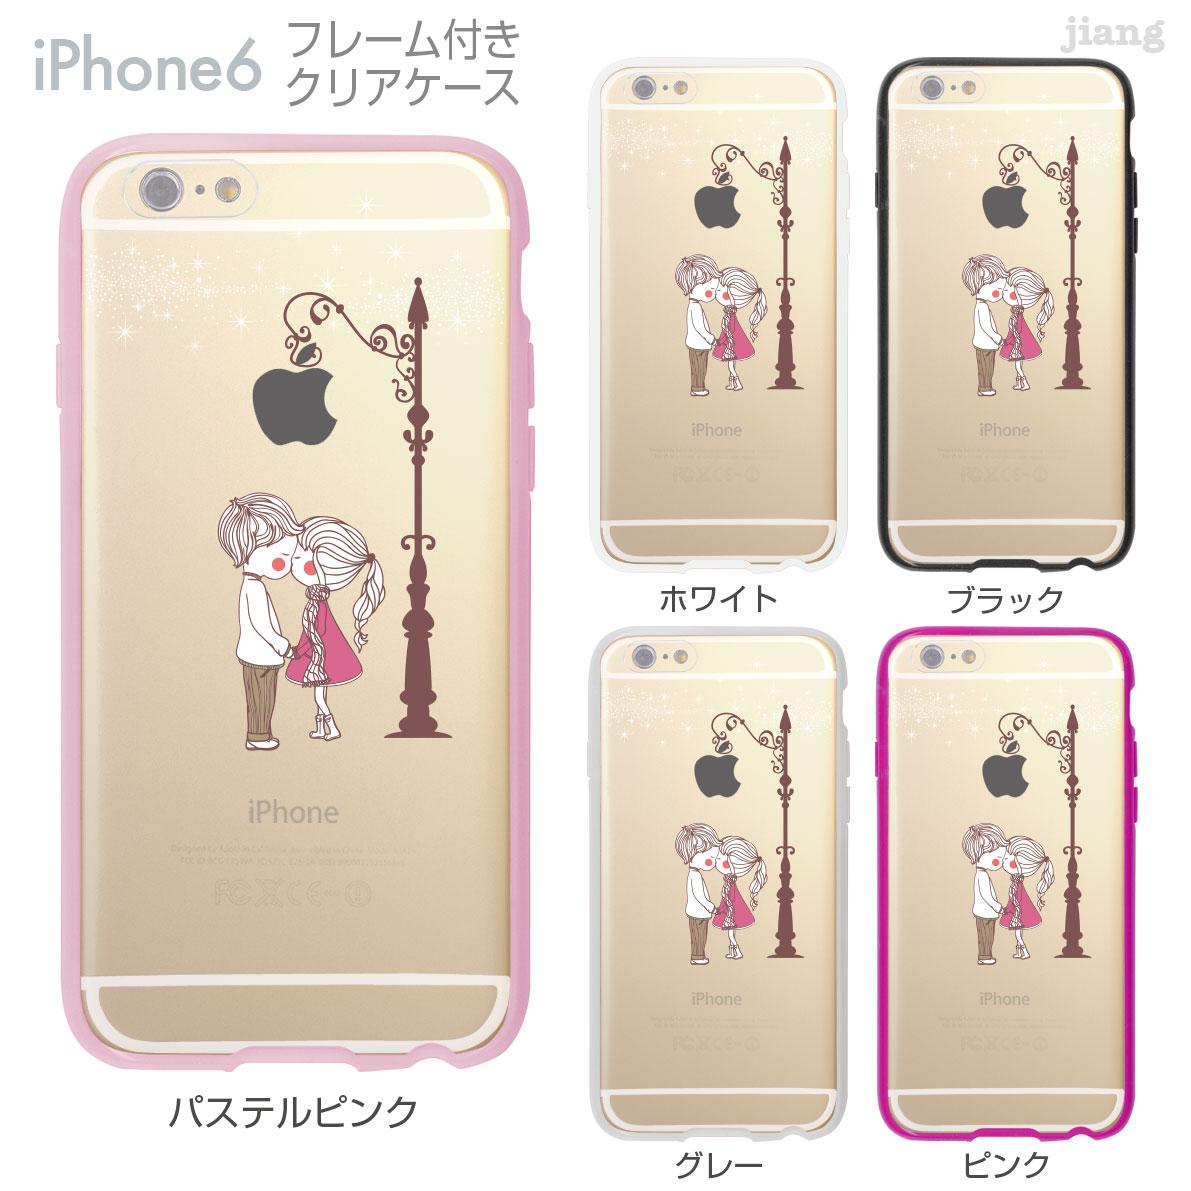 TK-JIANG   Rakuten Global Market: iPhone6 4.7 frames with case cover ...